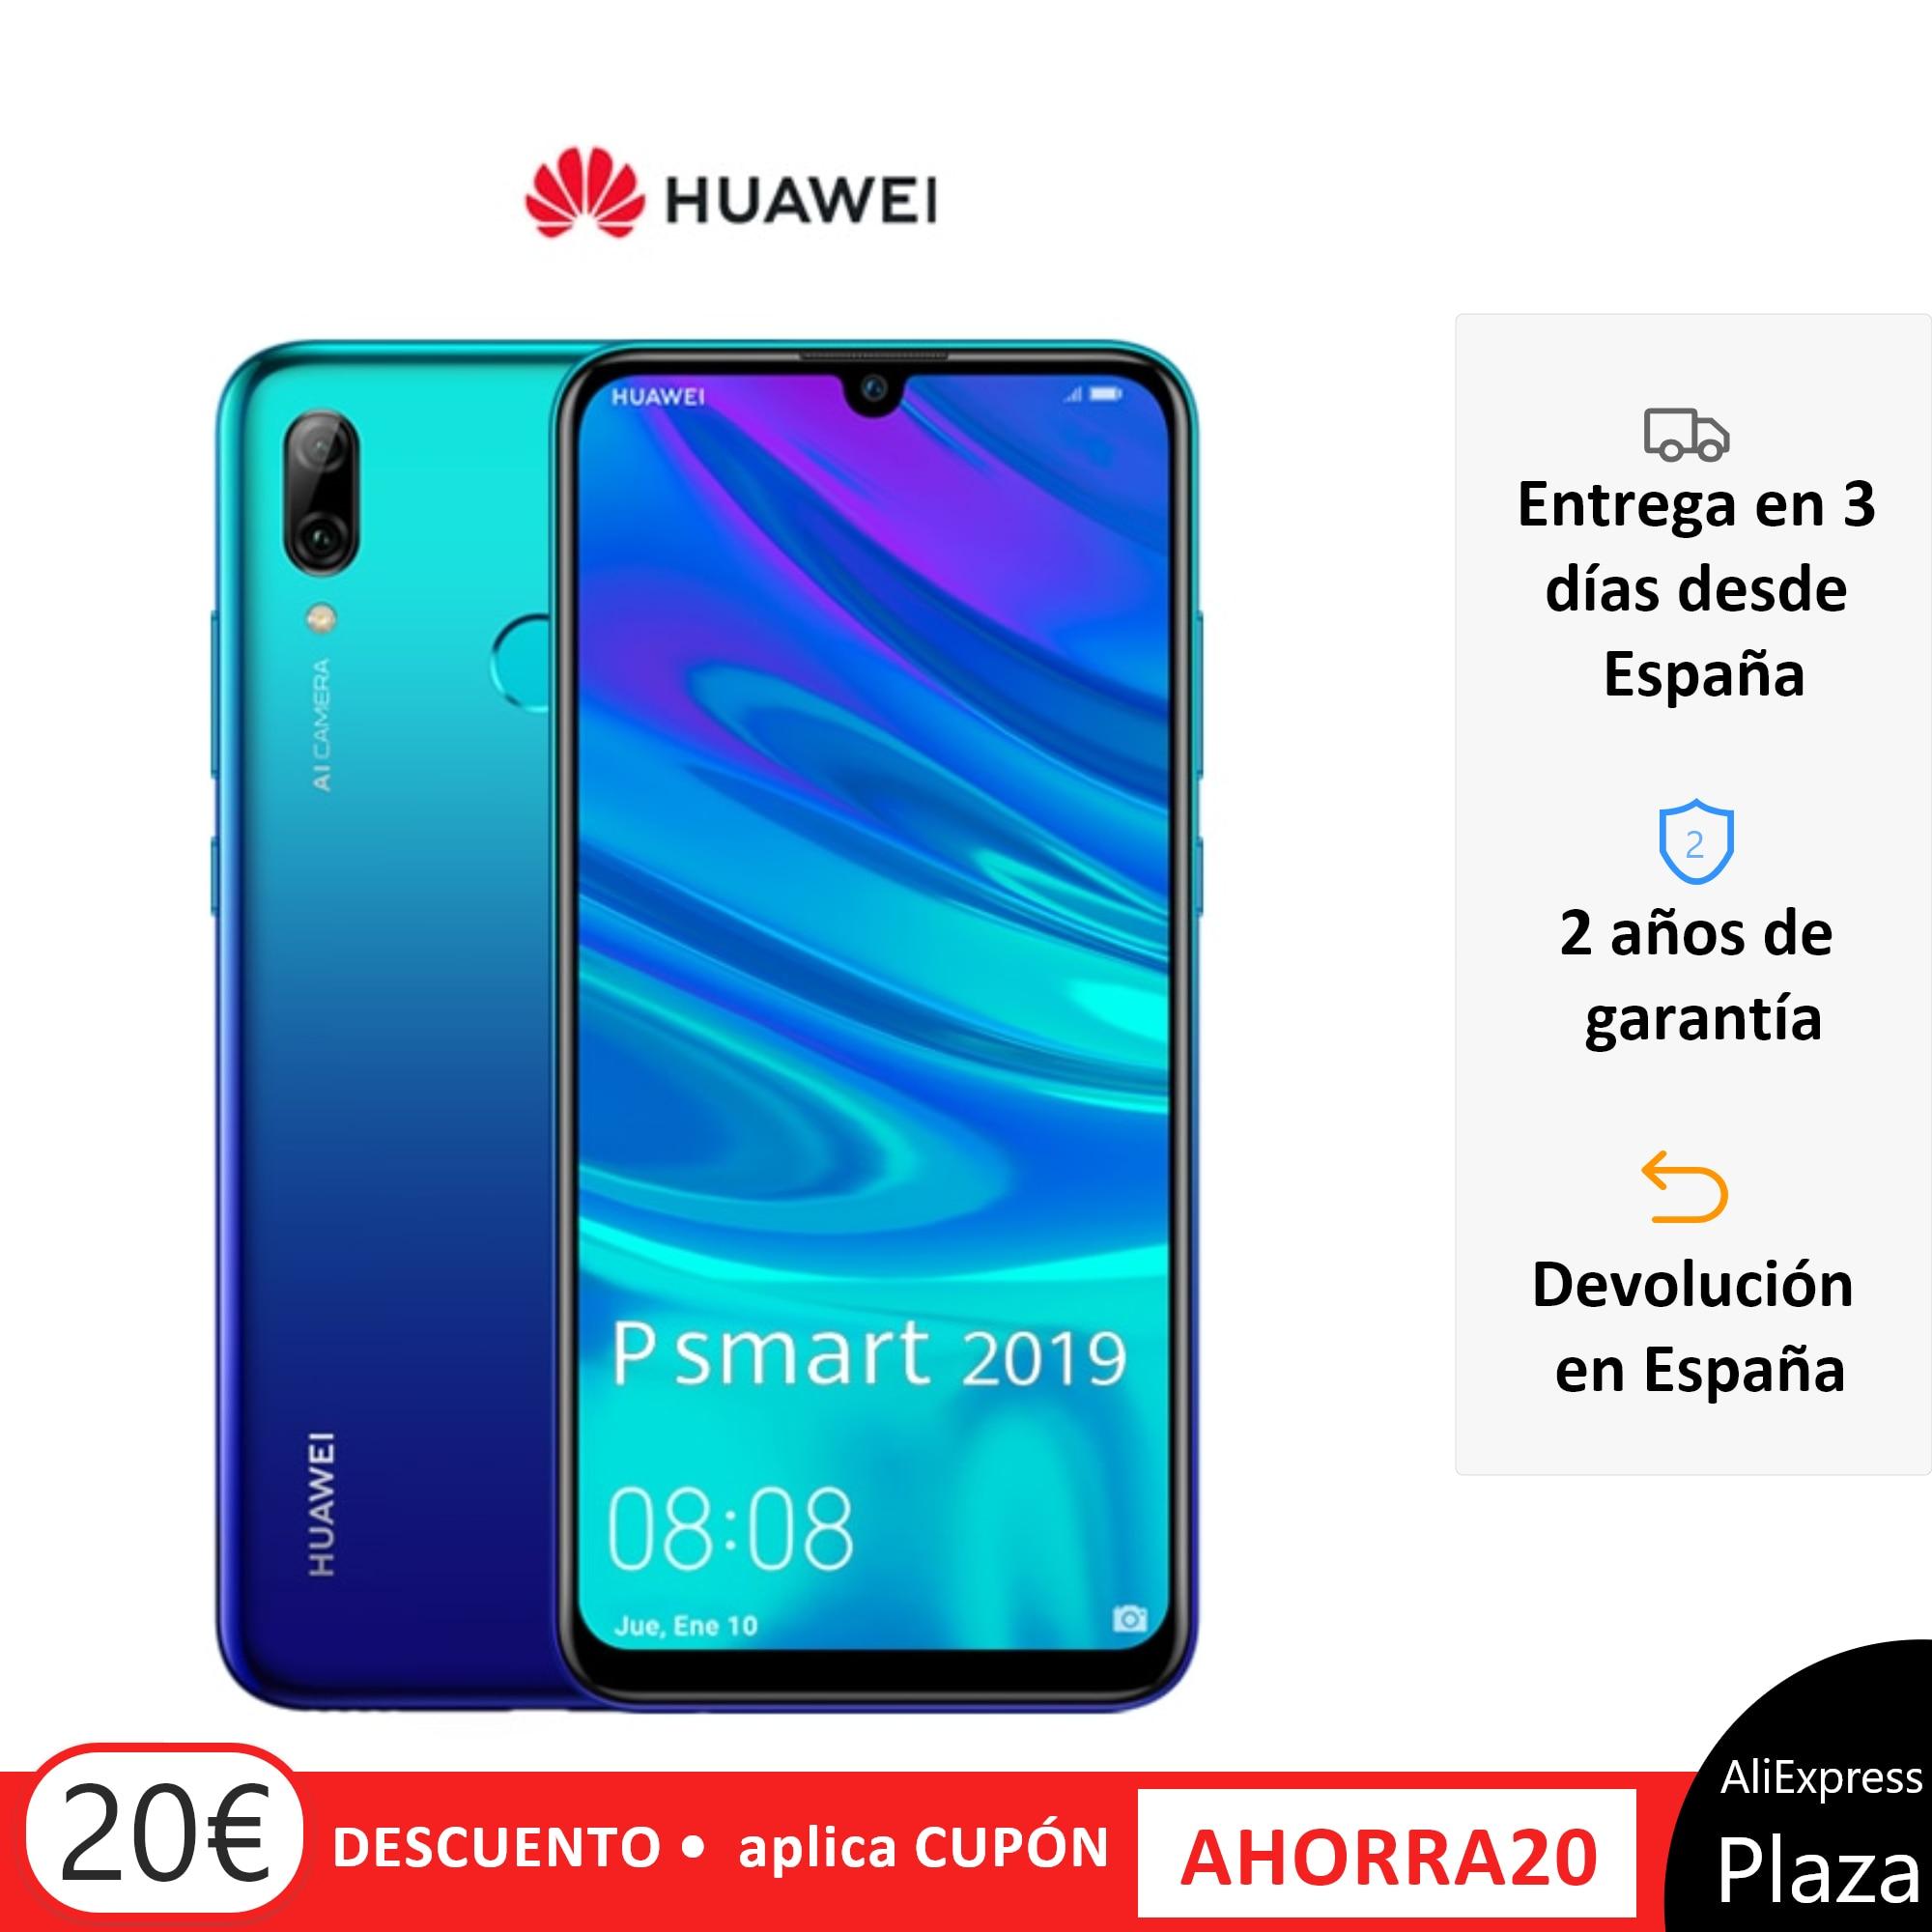 Huawei P Smart 2019 Smartphone (64GB ROM 3GB RAM Google, Android, Nuevo, Libre) [Teléfono Móvil Versión Española] Movil, Moviles